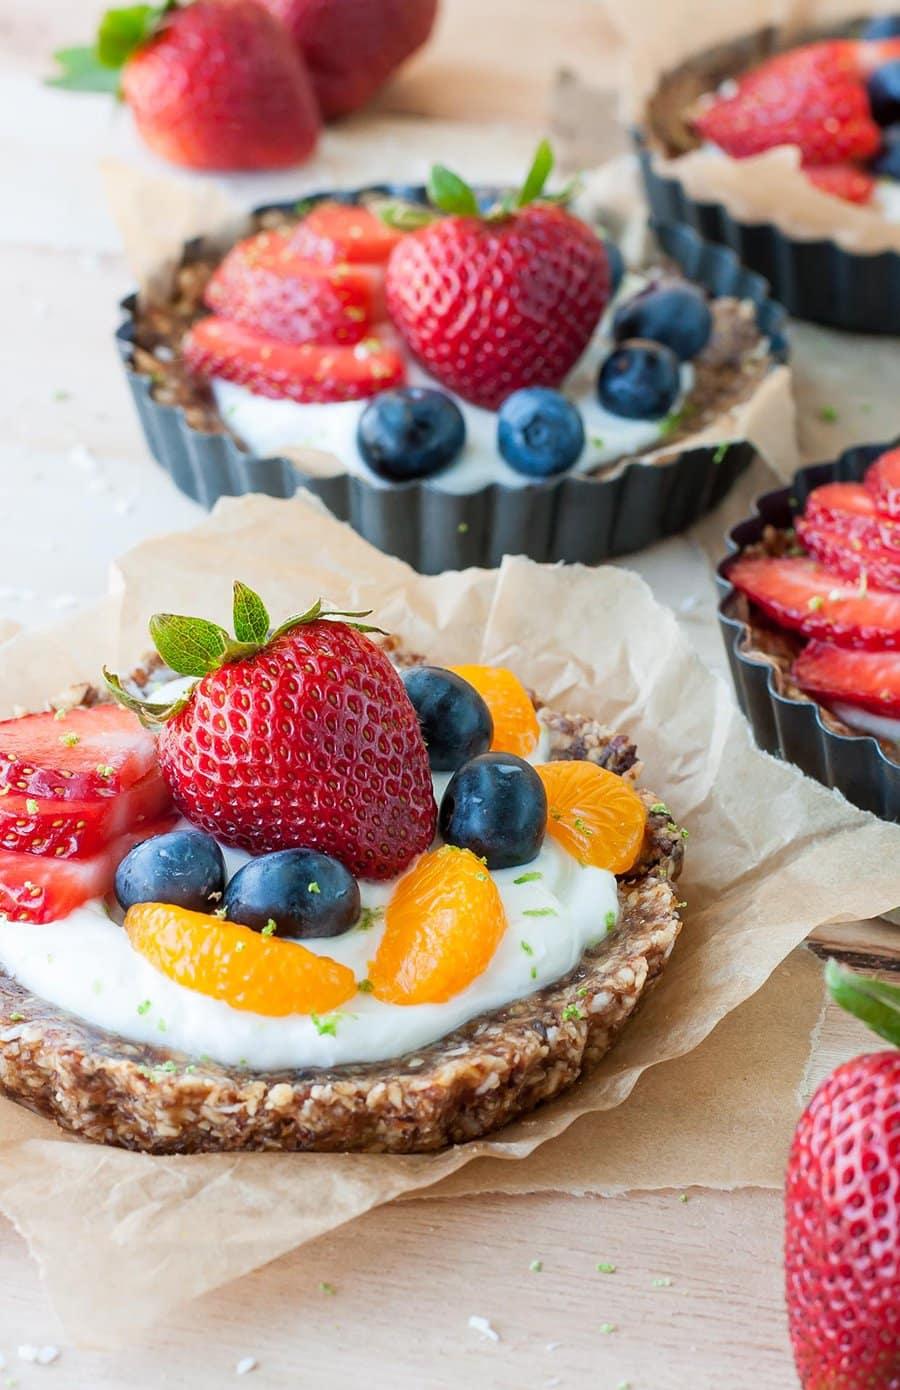 No Bake Coconut Lime Fruit Yogurt Tarts | Peas and Crayons